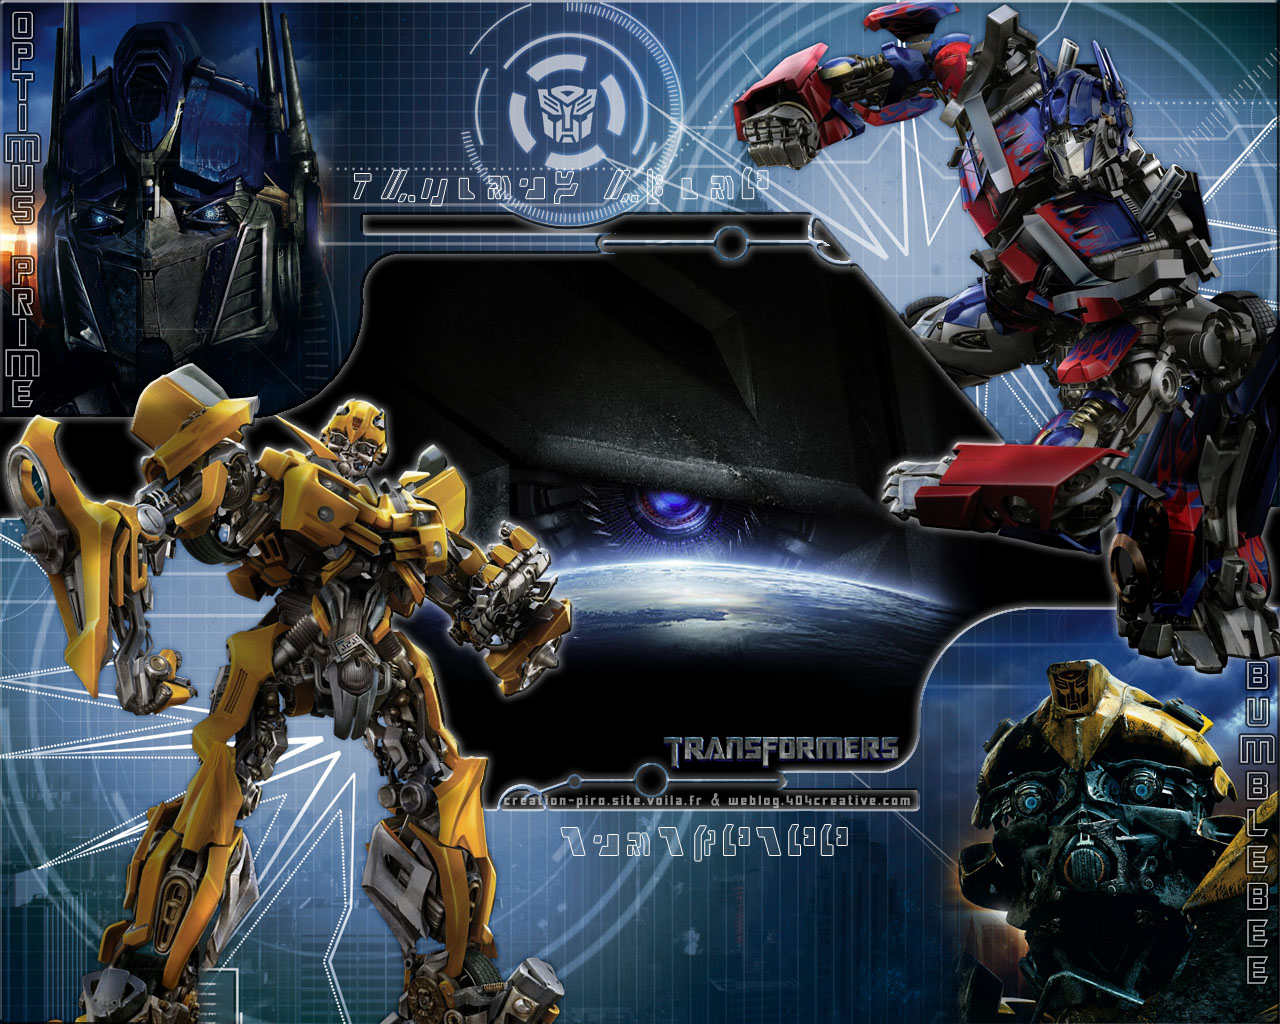 transformeri-spisok-filmov-po-poryadku